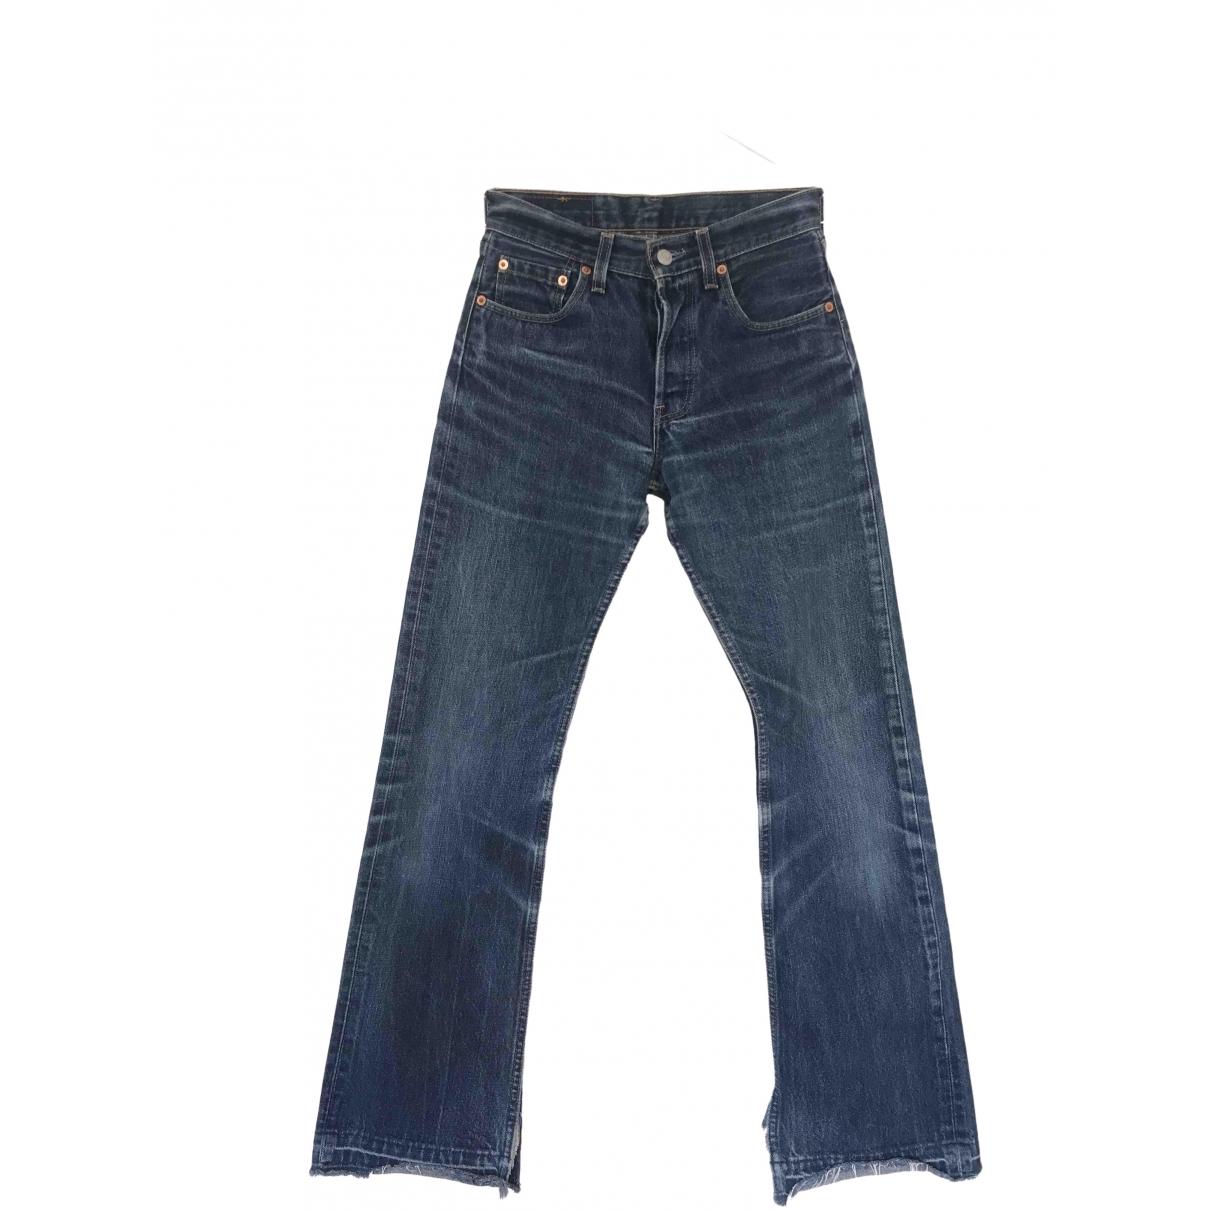 Levi's Vintage Clothing \N Blue Denim - Jeans Jeans for Women 34 FR